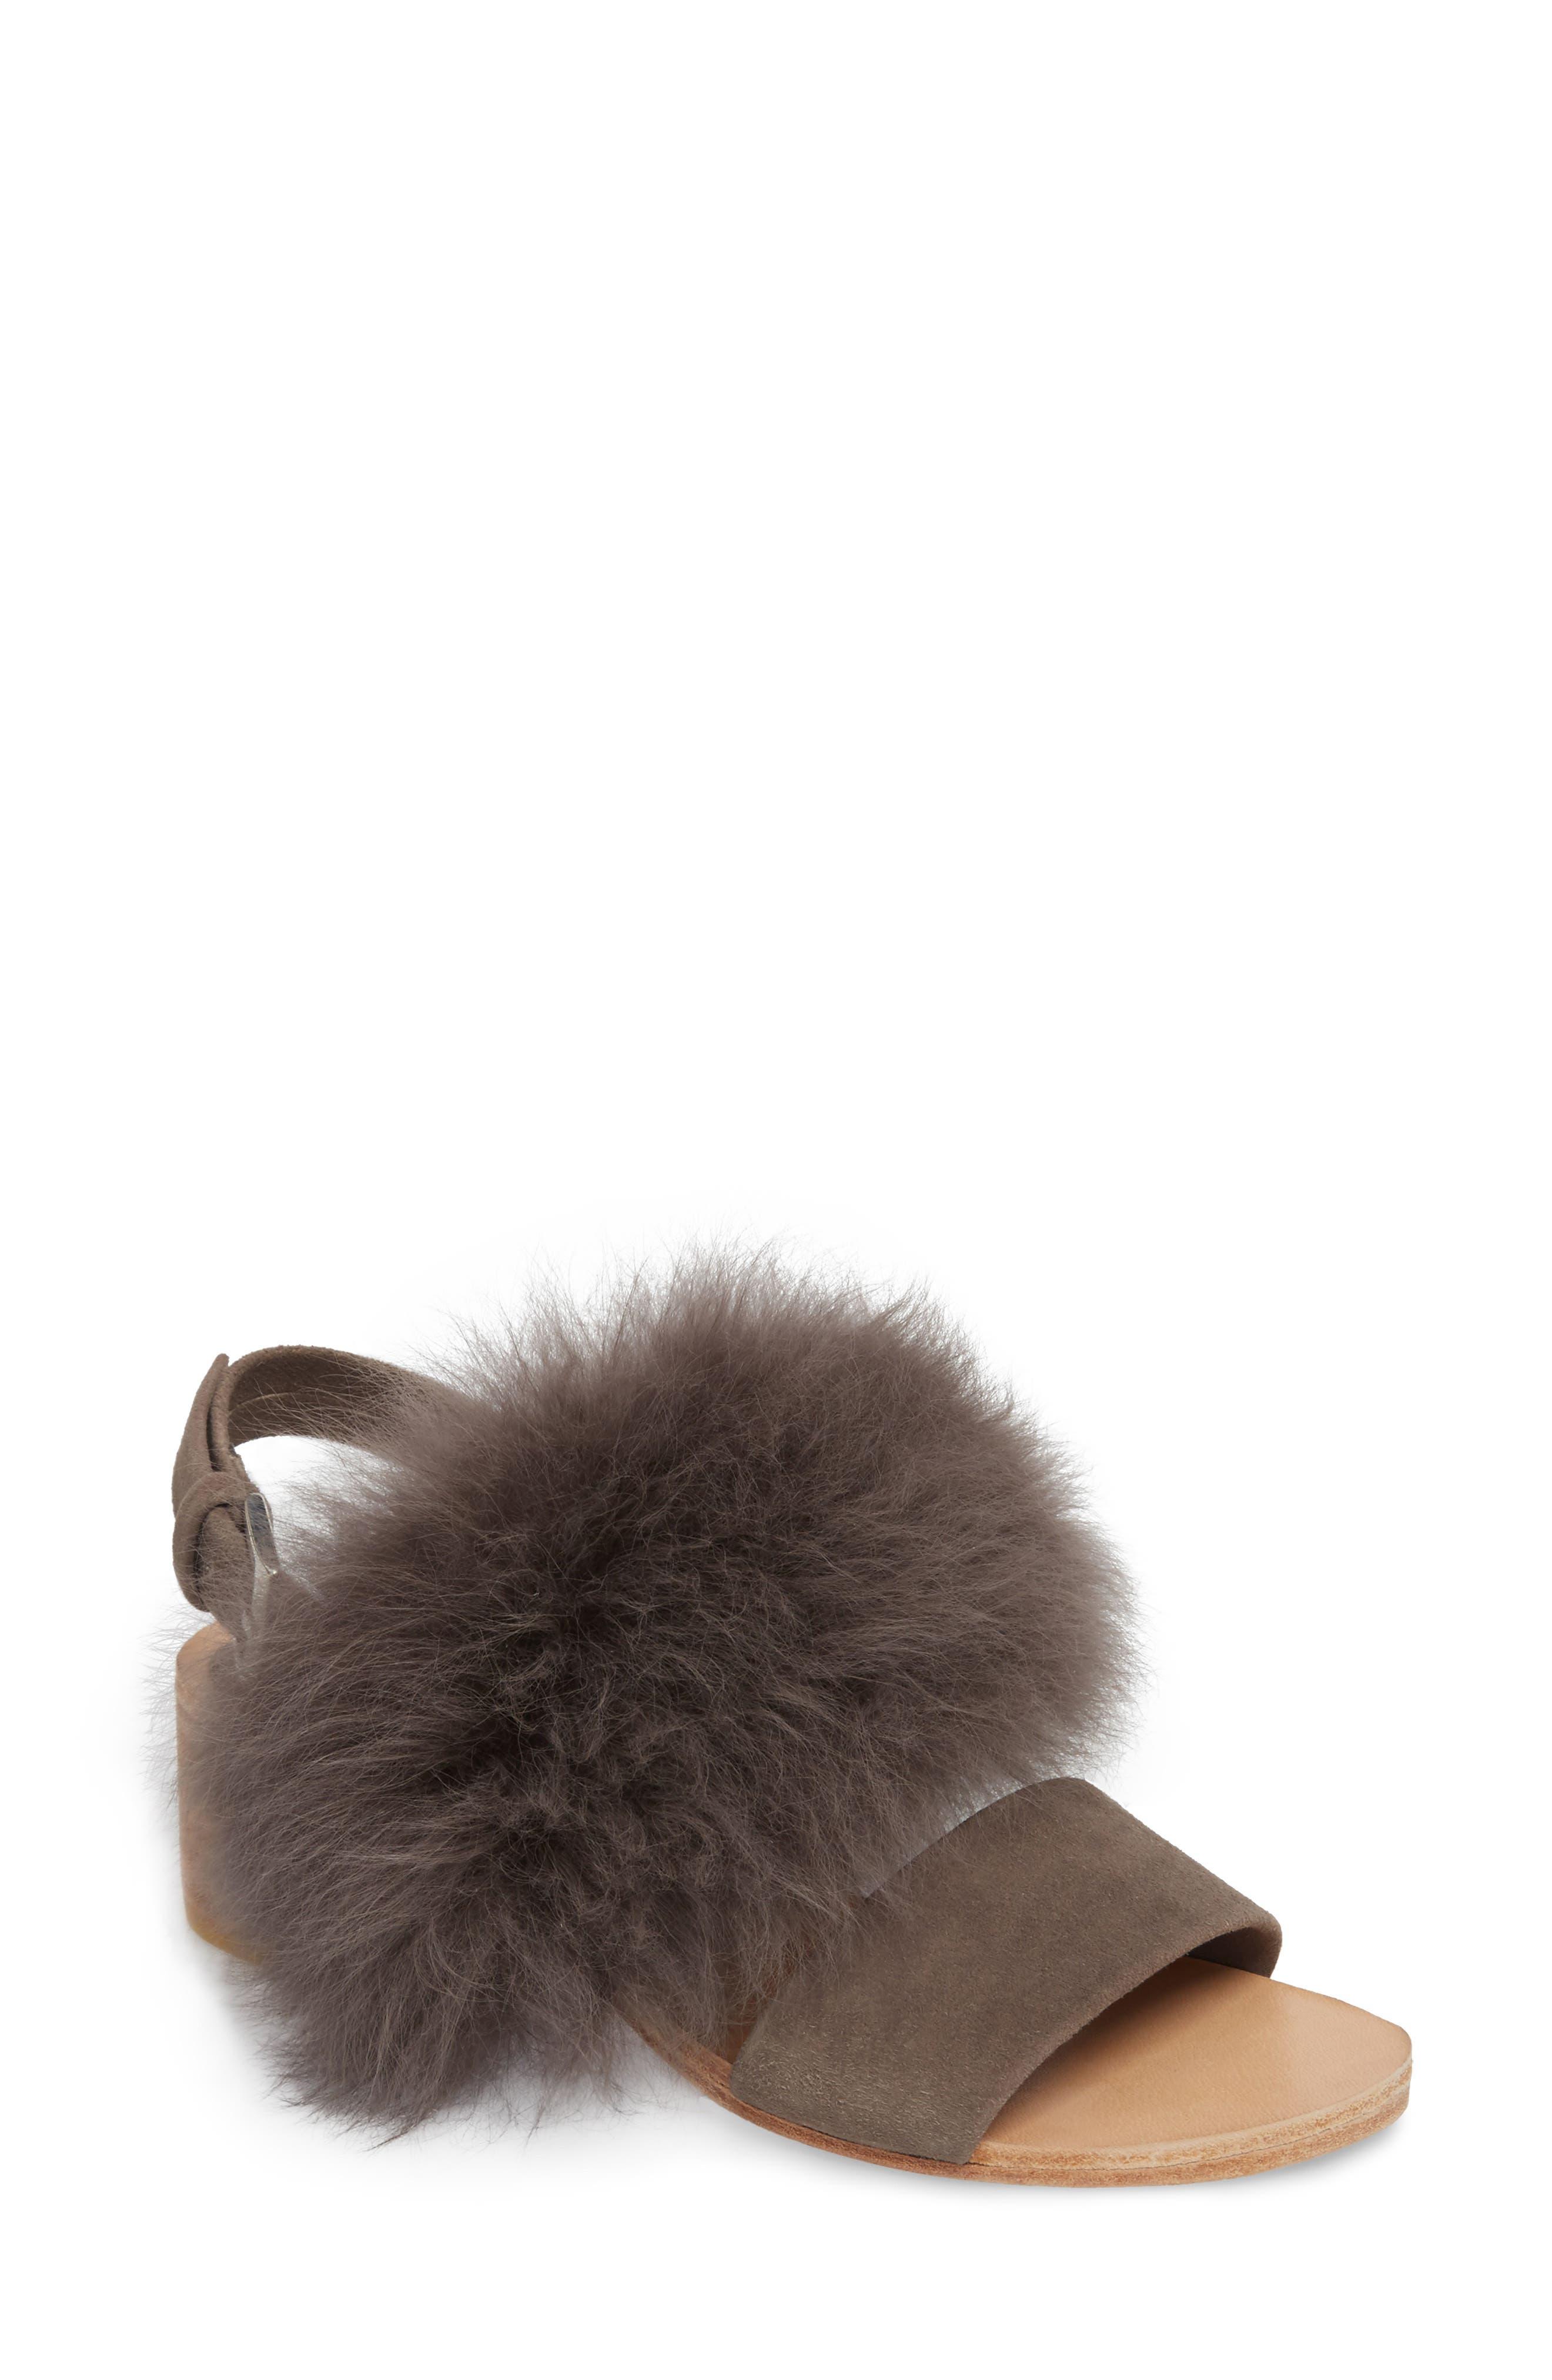 Huma Blanco Clemence Genuine Alpaca Fur Sandal